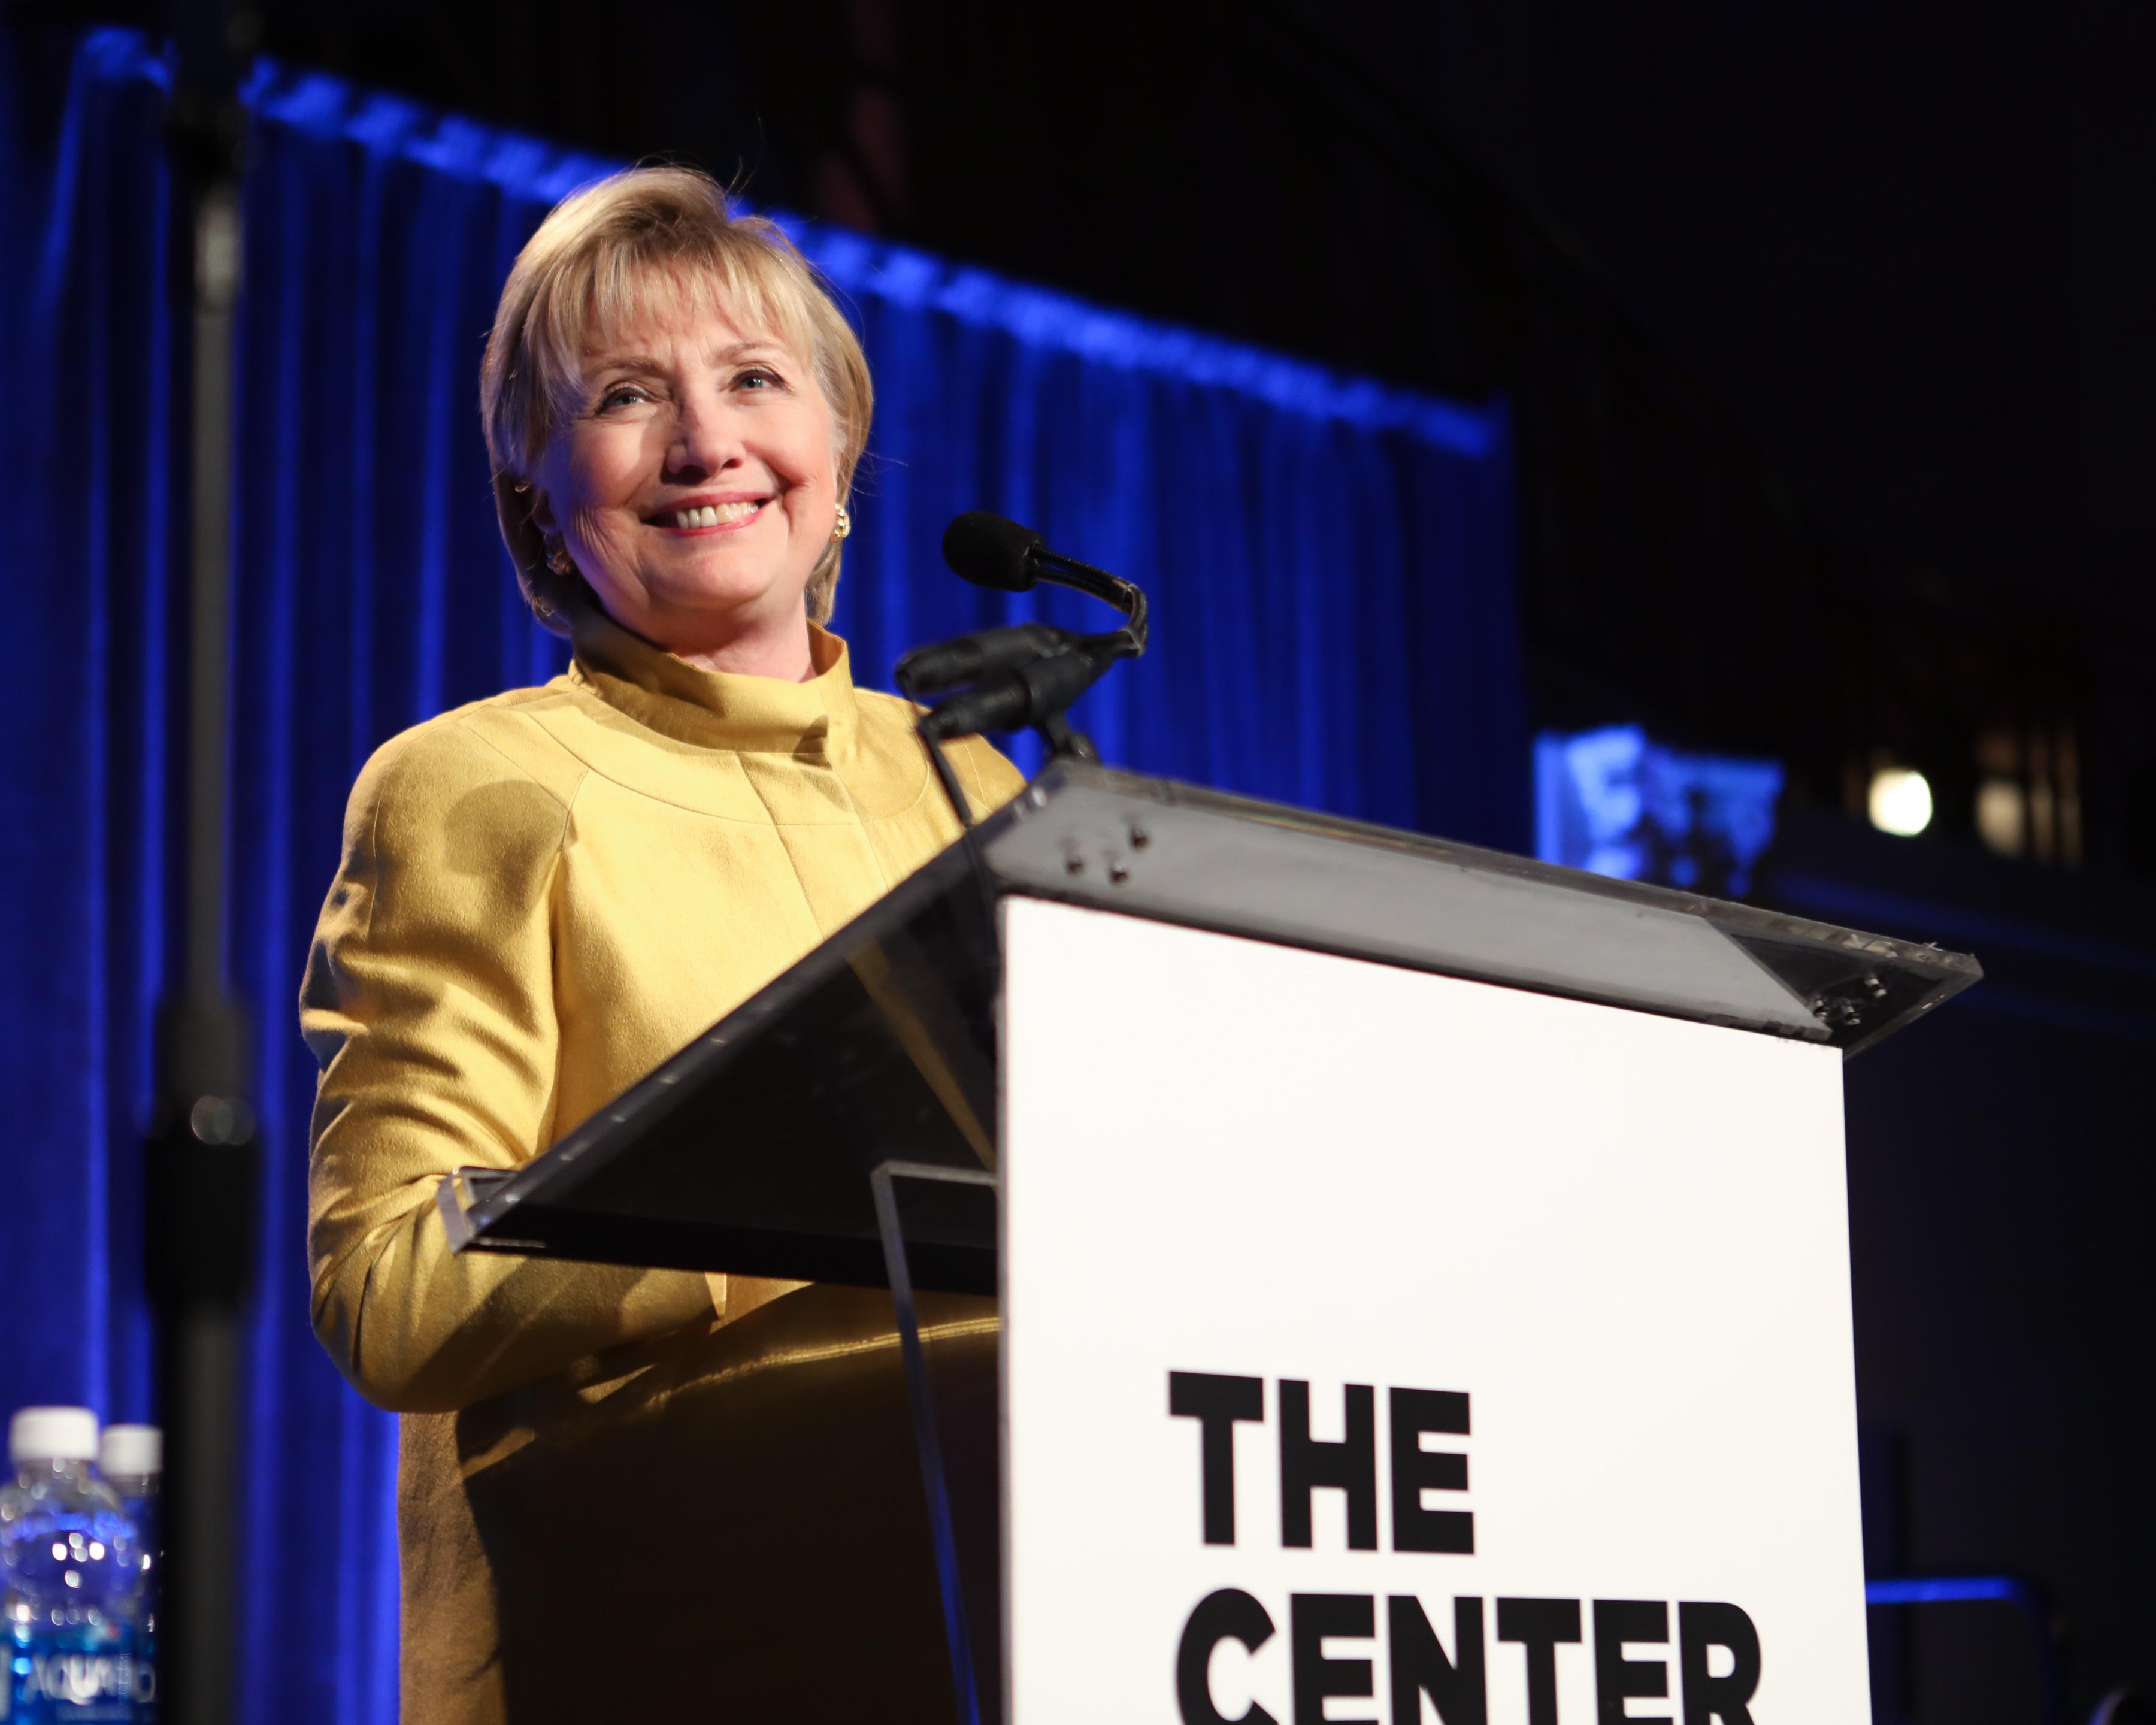 Hillary ClintonLGBT Community Center of New York Annual Fundraising Dinner, Inside, New York, USA - 20 Apr 2017